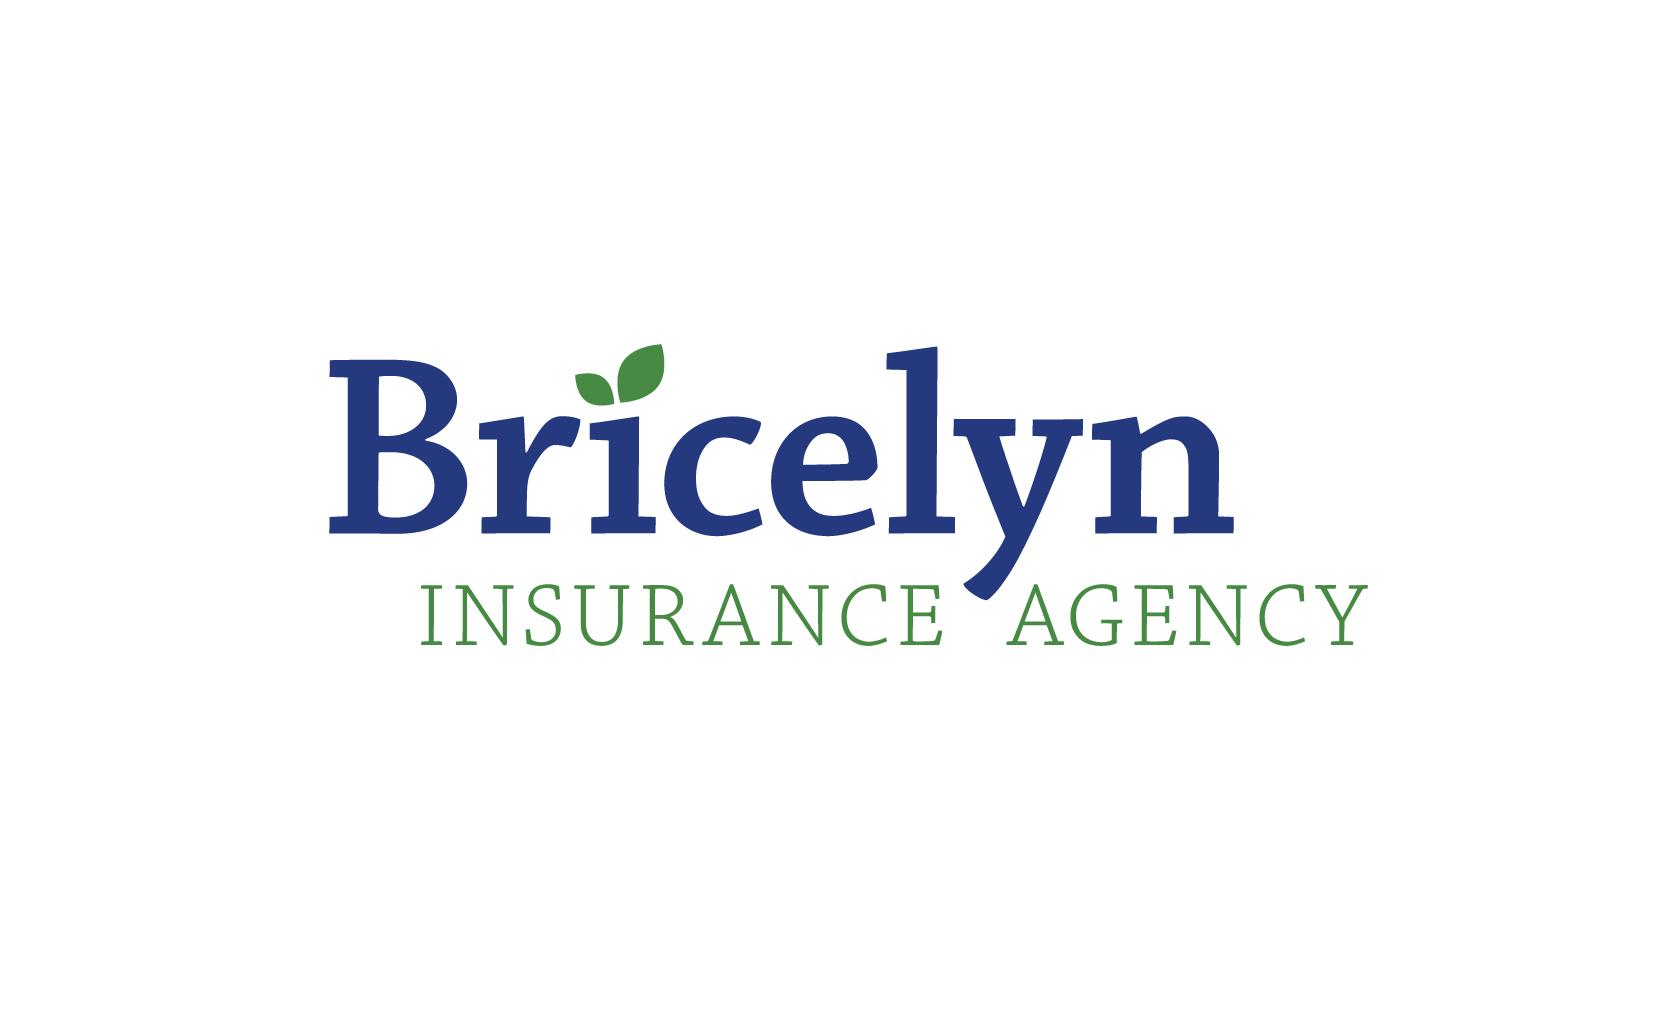 BricelynIA_Logo-01.jpg